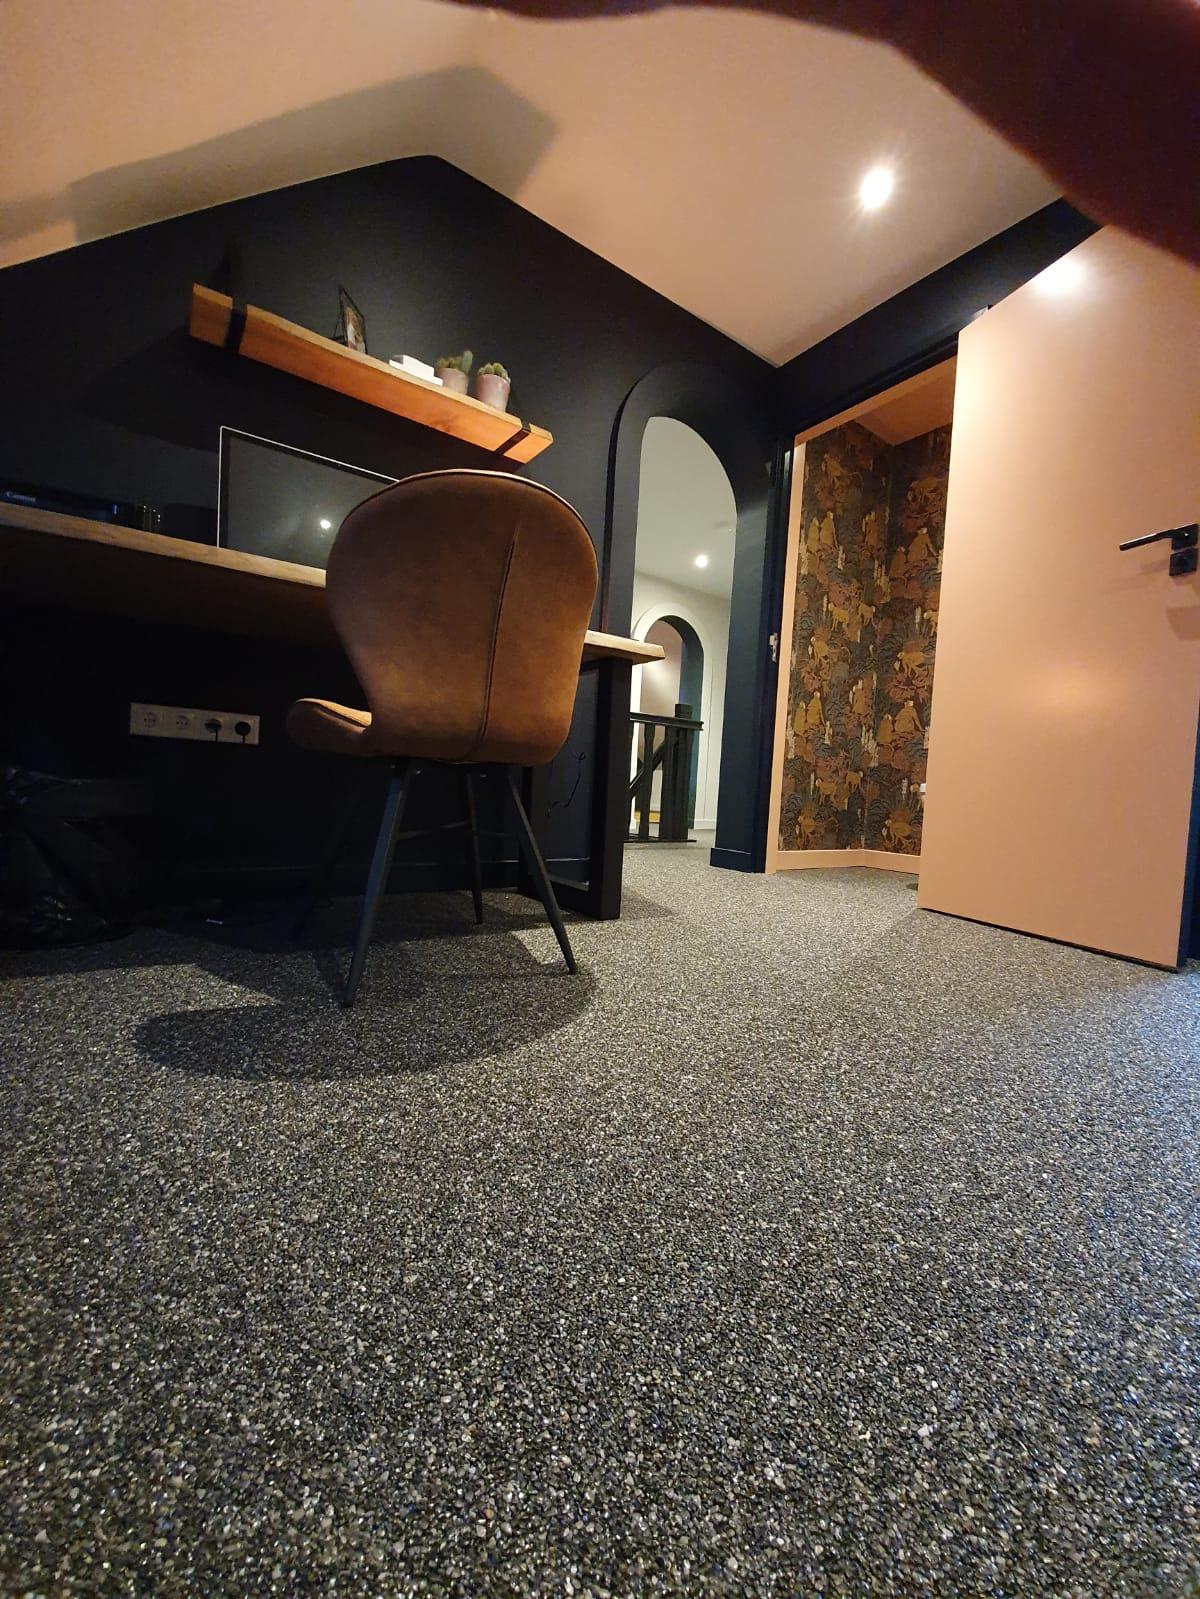 Marmerstone vloer voor Sint-Oedenrode en omgeving 2 | Van Tol Vloeren